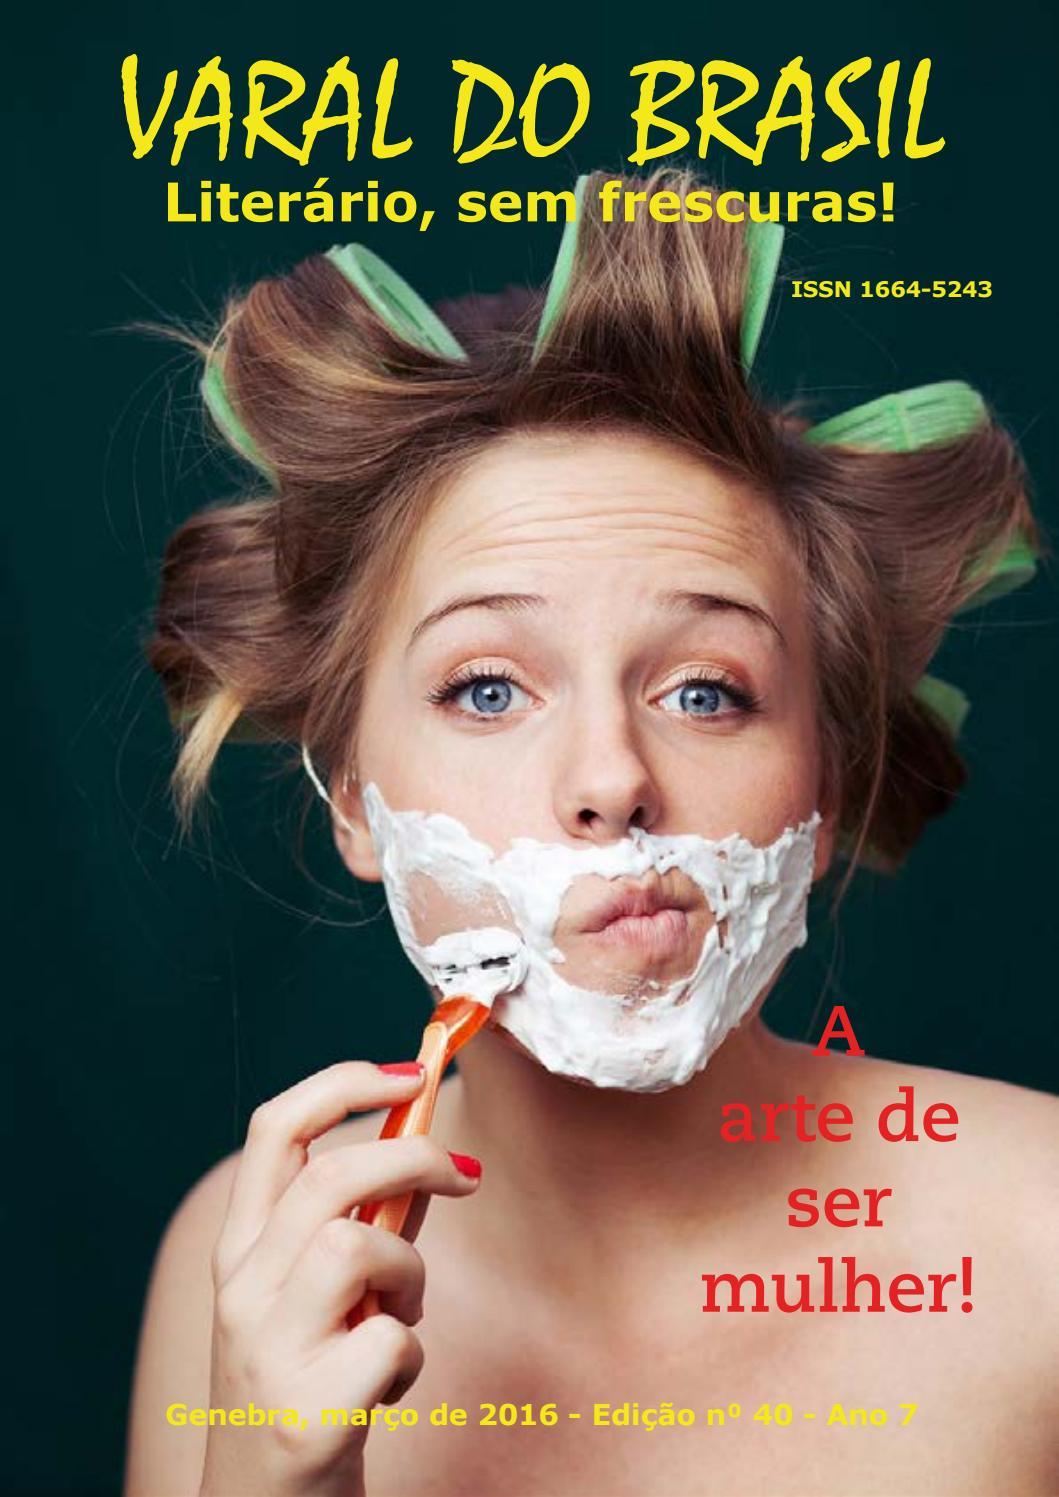 65e84fbe9 Revista Varal do Brasil - ed 40 - março de 2016 by Ana Rosenrot - issuu